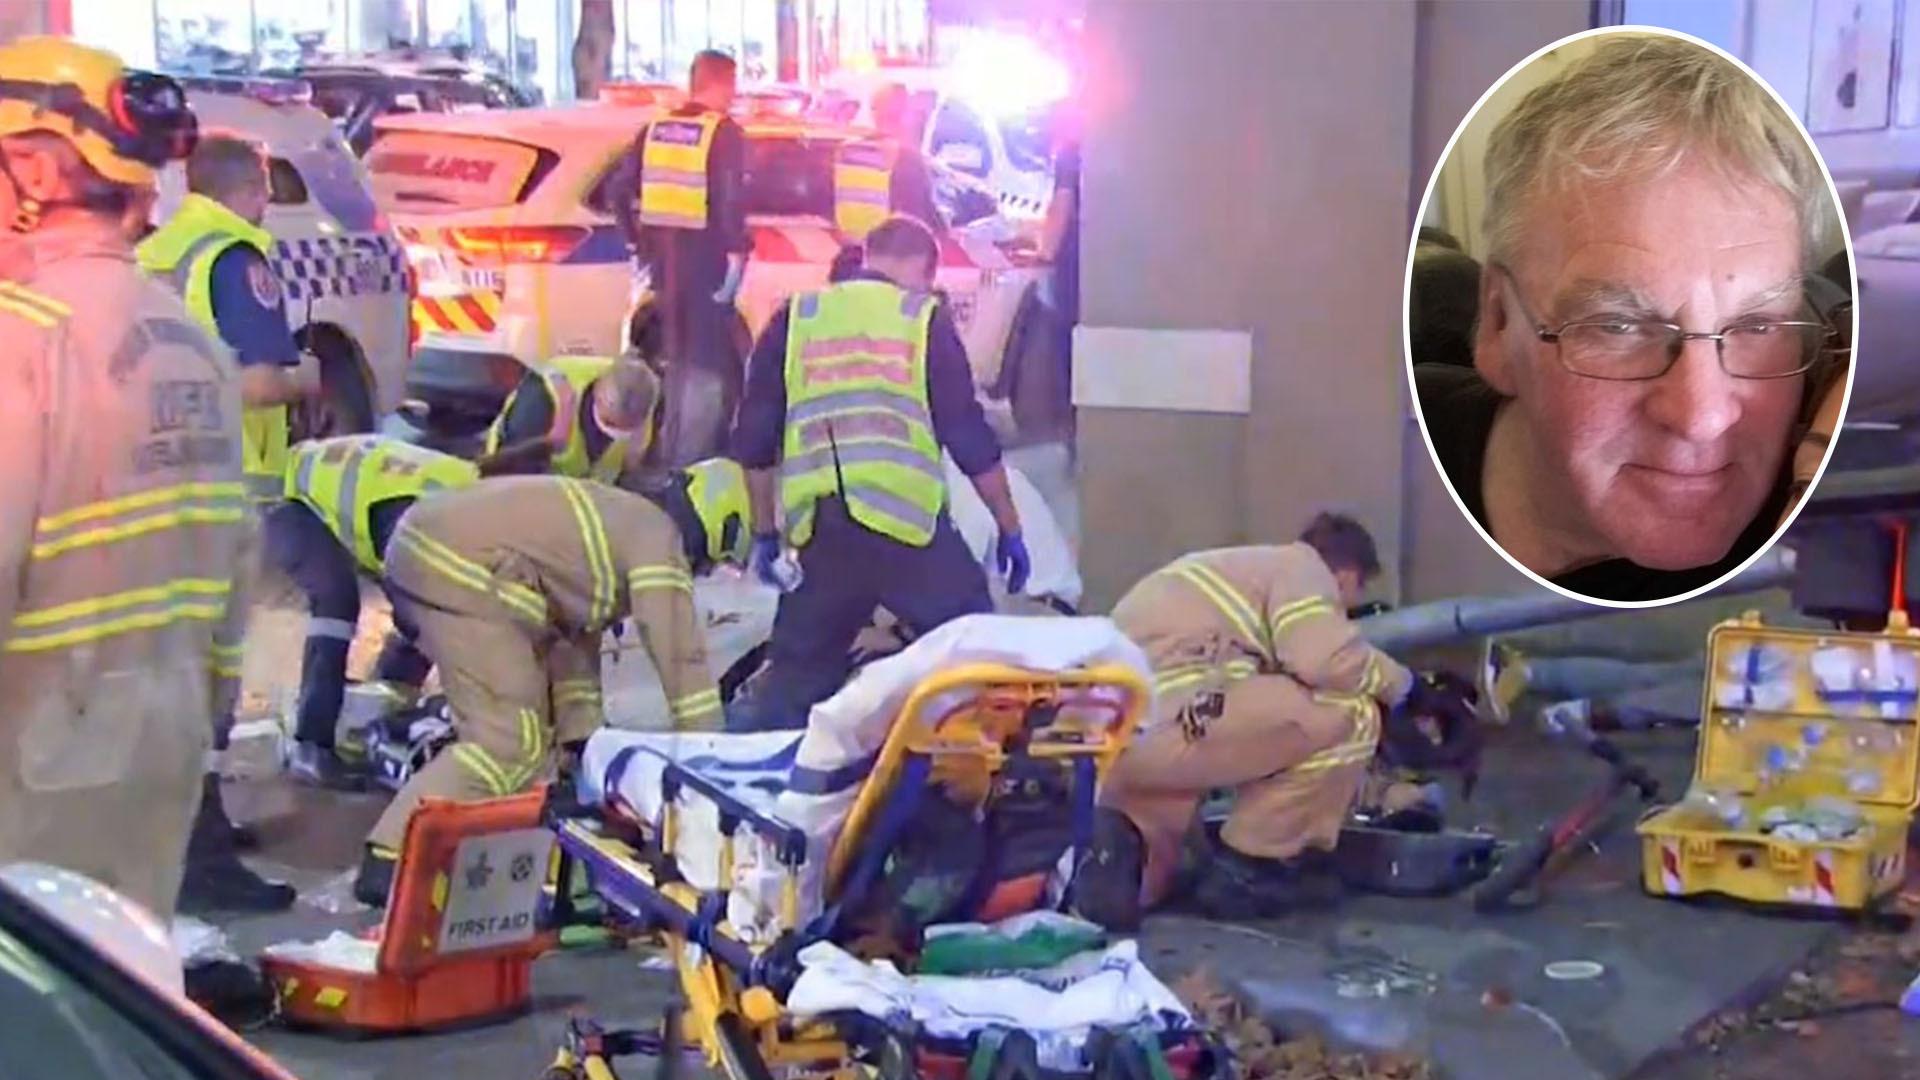 Melbourne truck driver bailed after allegedly hitting five pedestrians